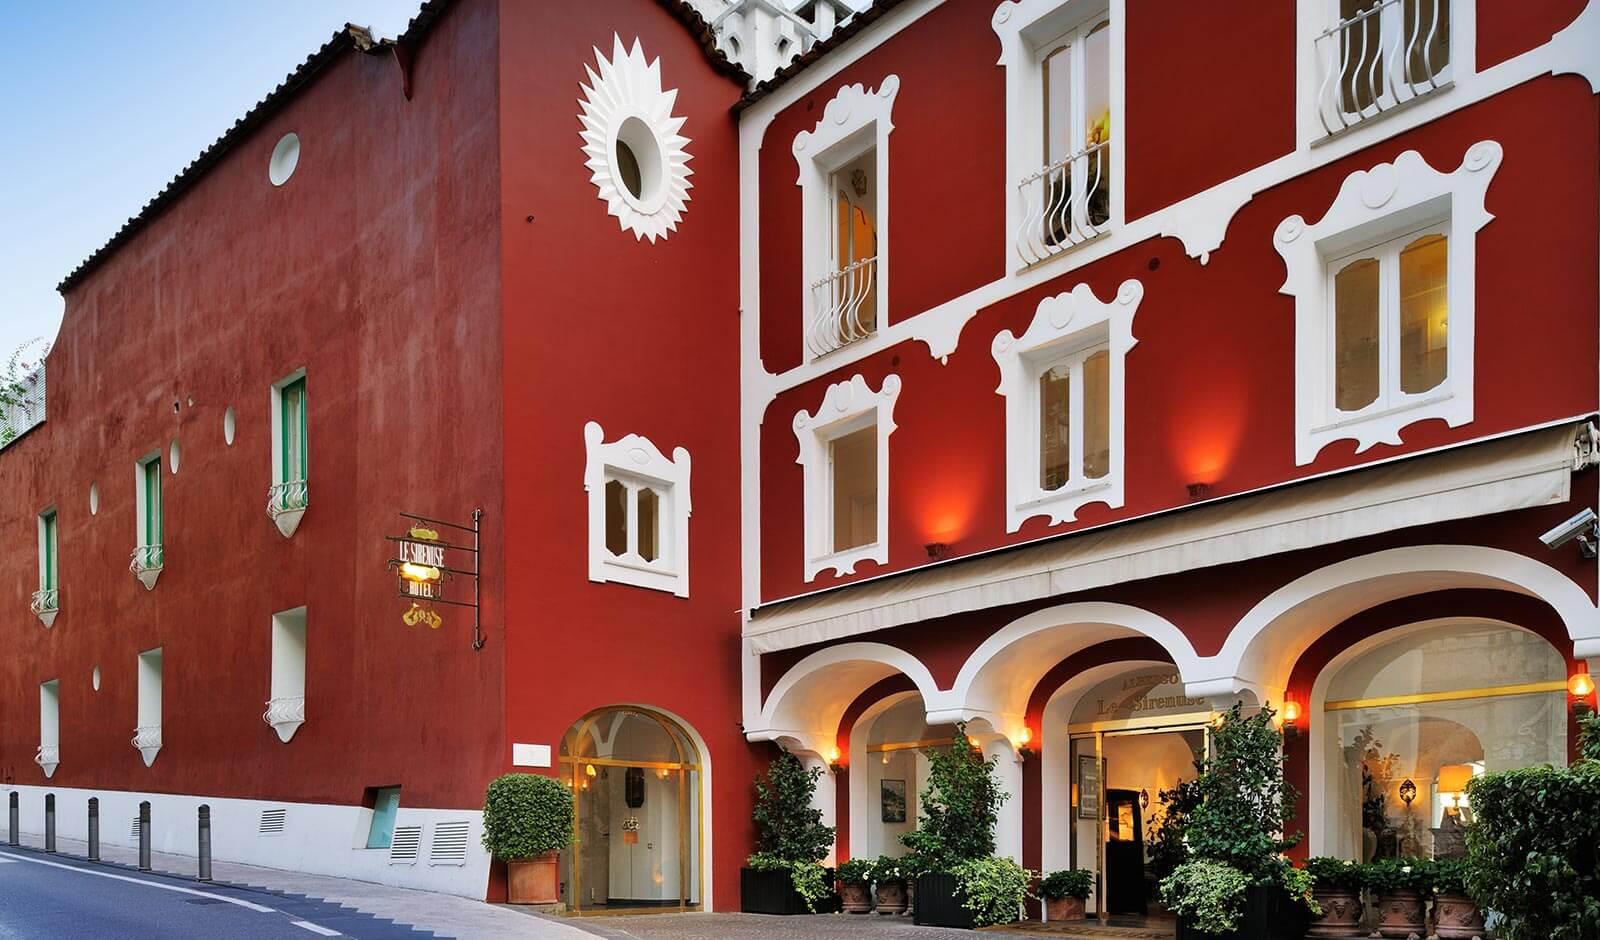 Façade de l'hôtel Sirenuse